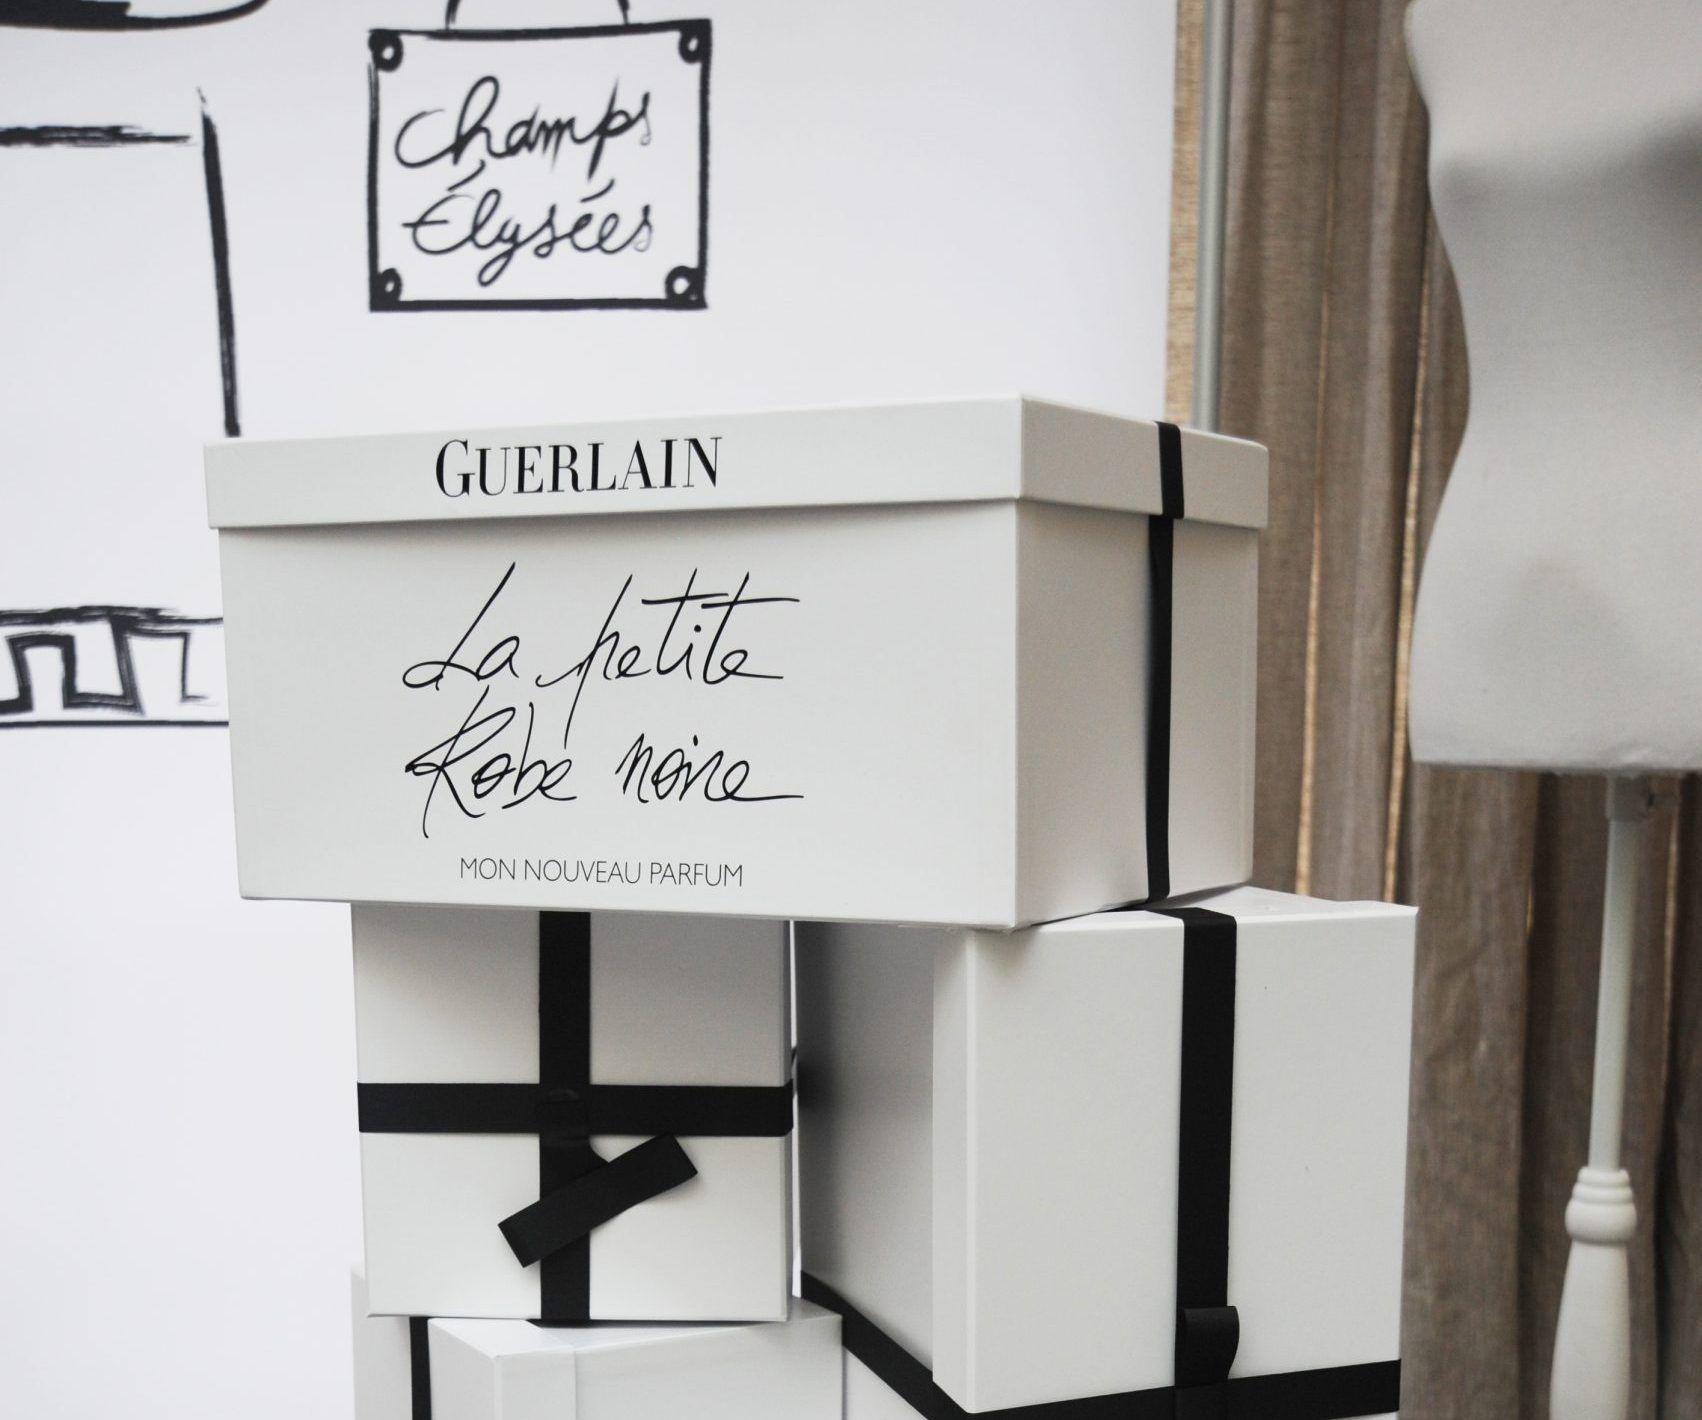 Case Study: Guerlain